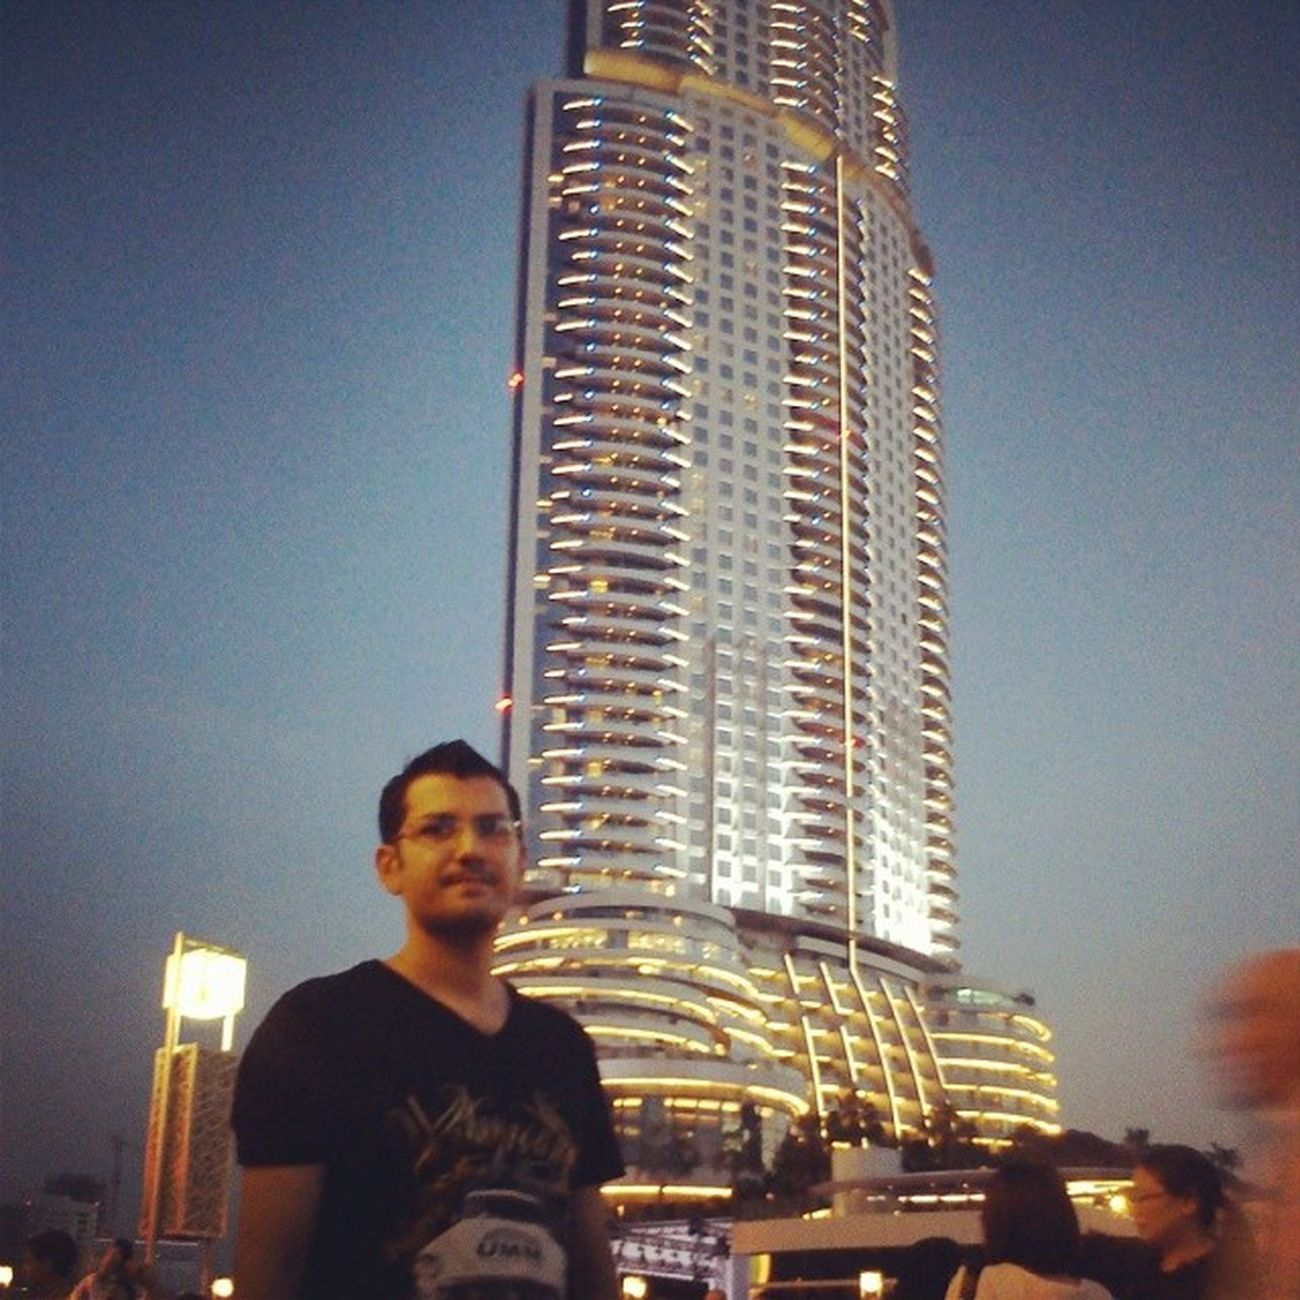 Building opposite to Burjkhalifa Dubai Expo2020